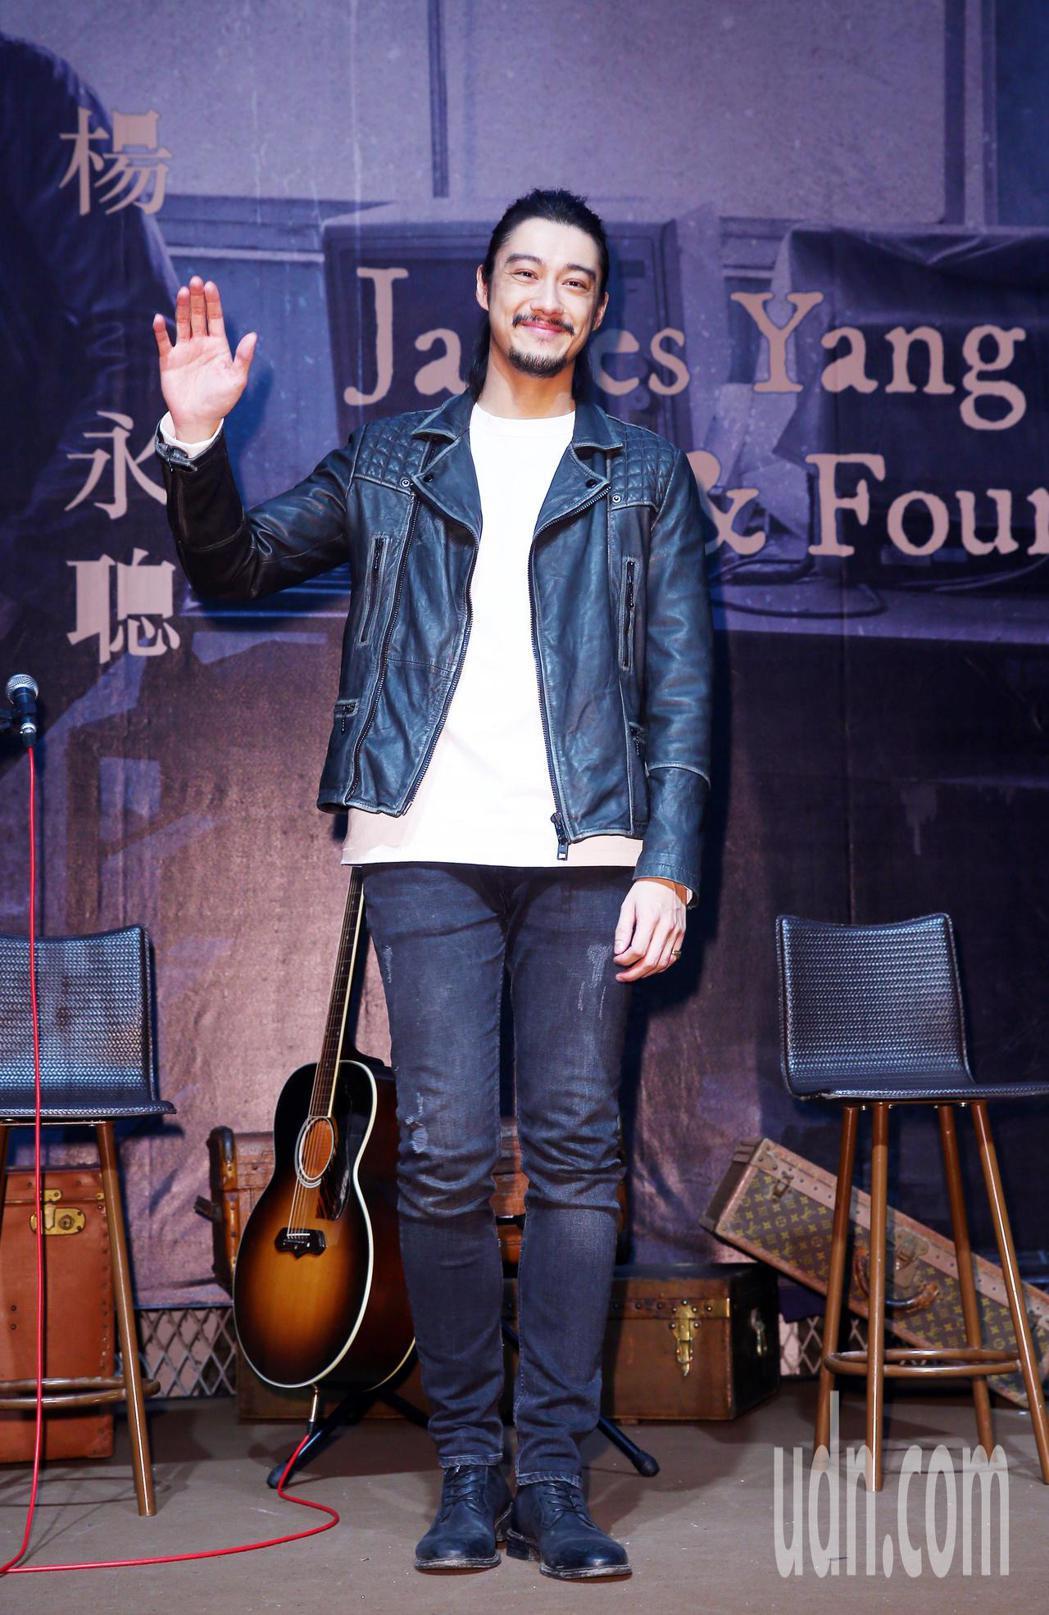 James楊永聰在一身酷帥裝扮下出席中英文創作新專輯「Lost&Found」的記...